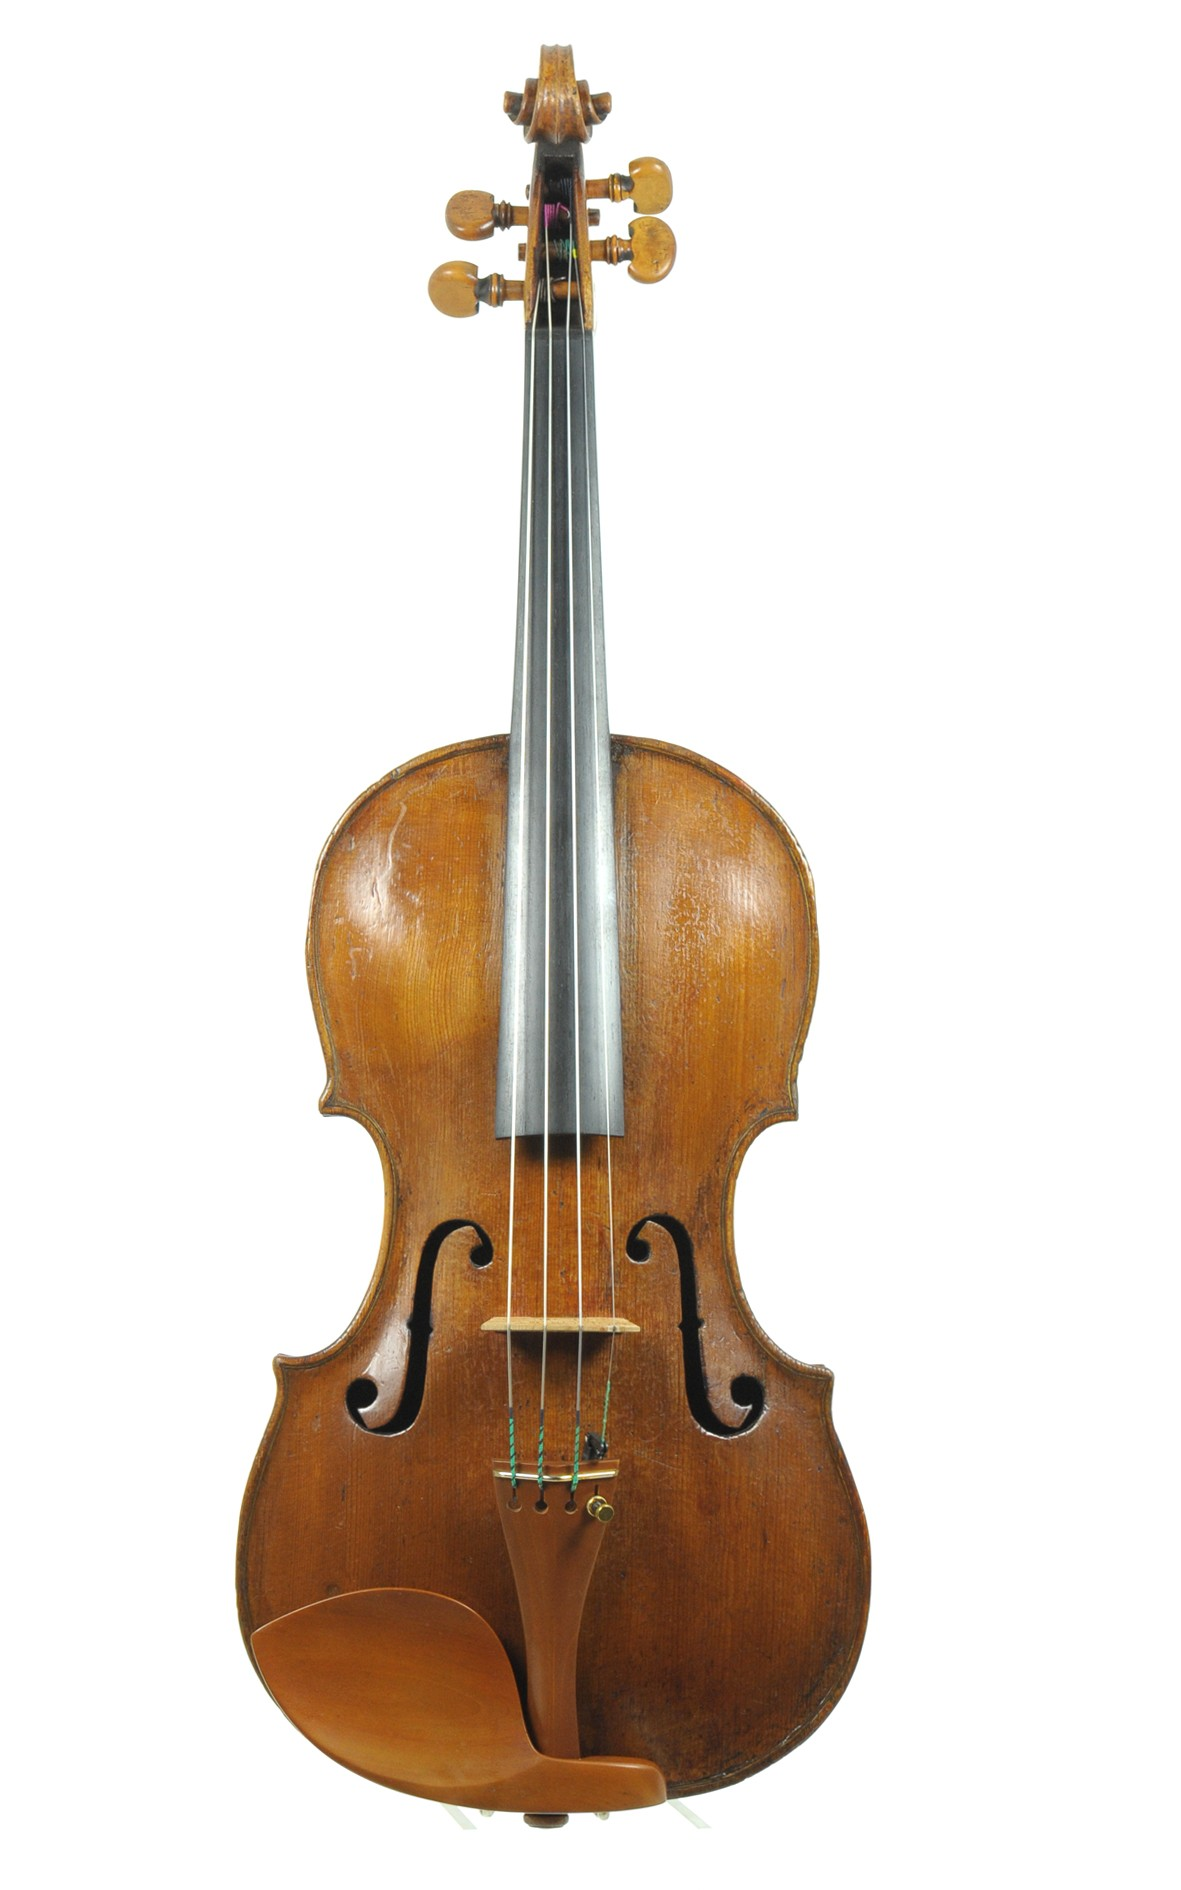 Englische Geige, London, John Johnson Schule um 1750